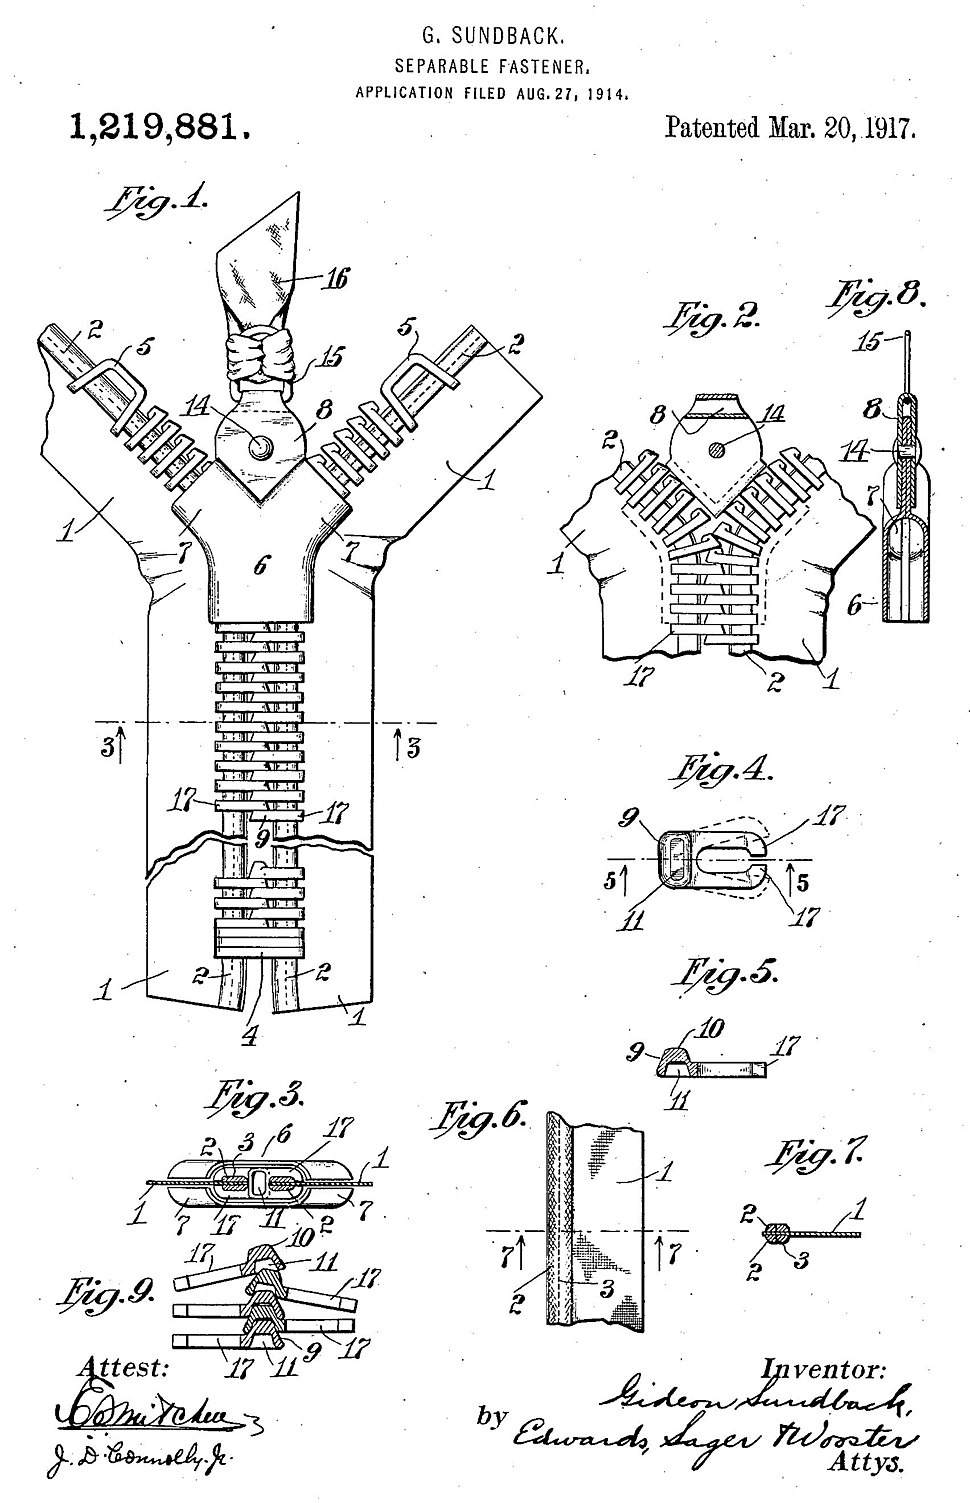 001 Sundback zipper 1917 patent